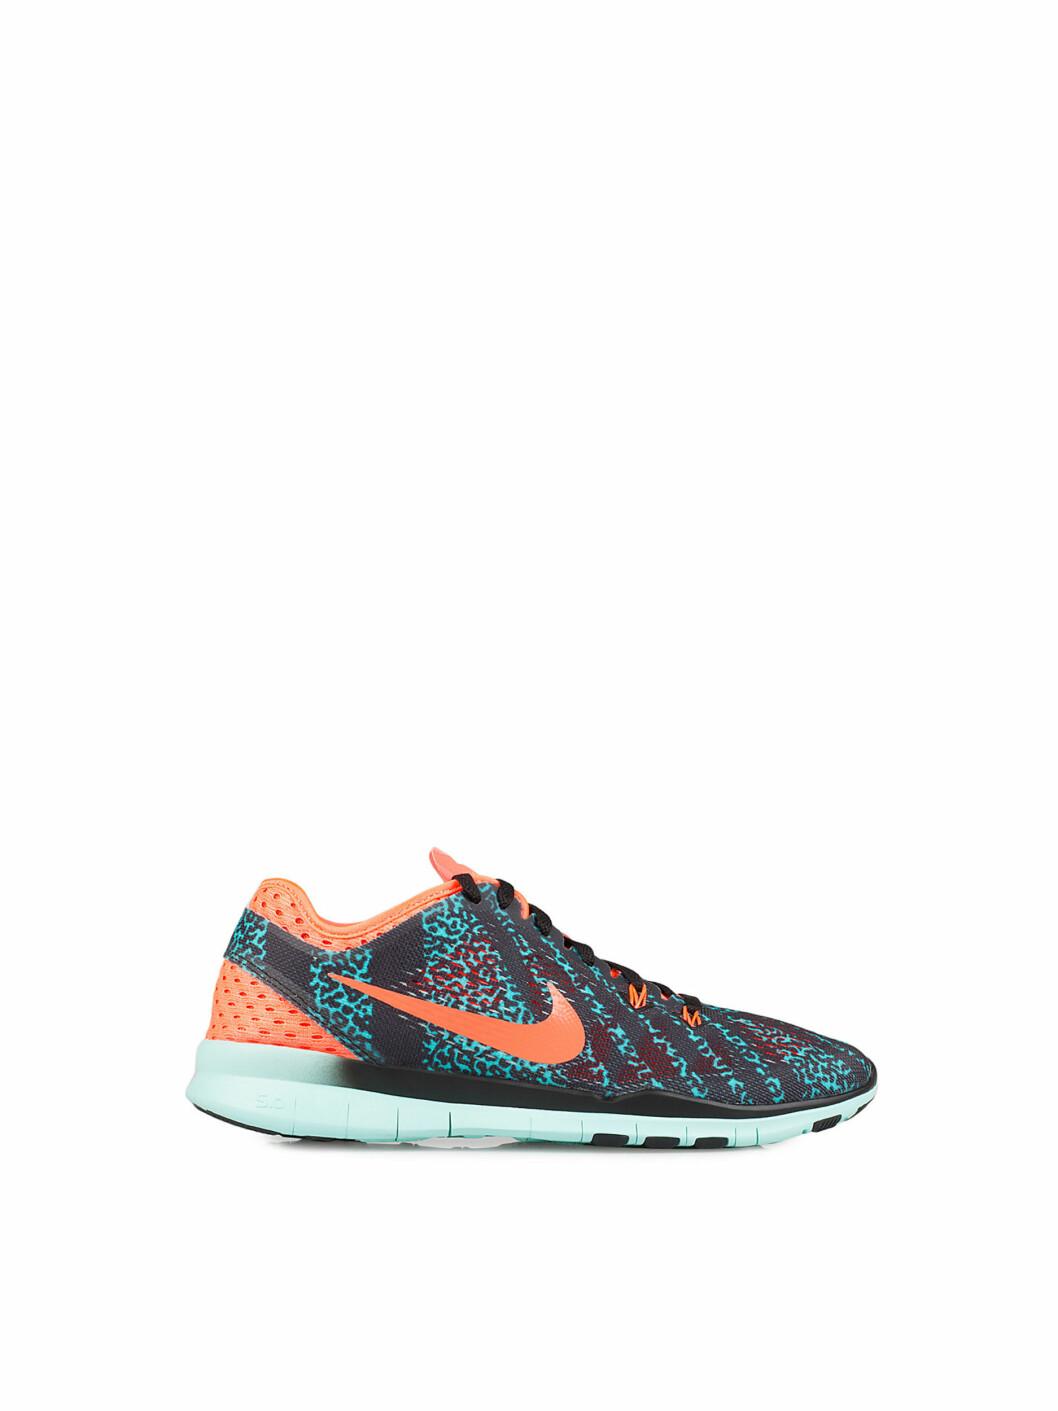 Joggesko fra Nike via Nelly.com, kr 1195.